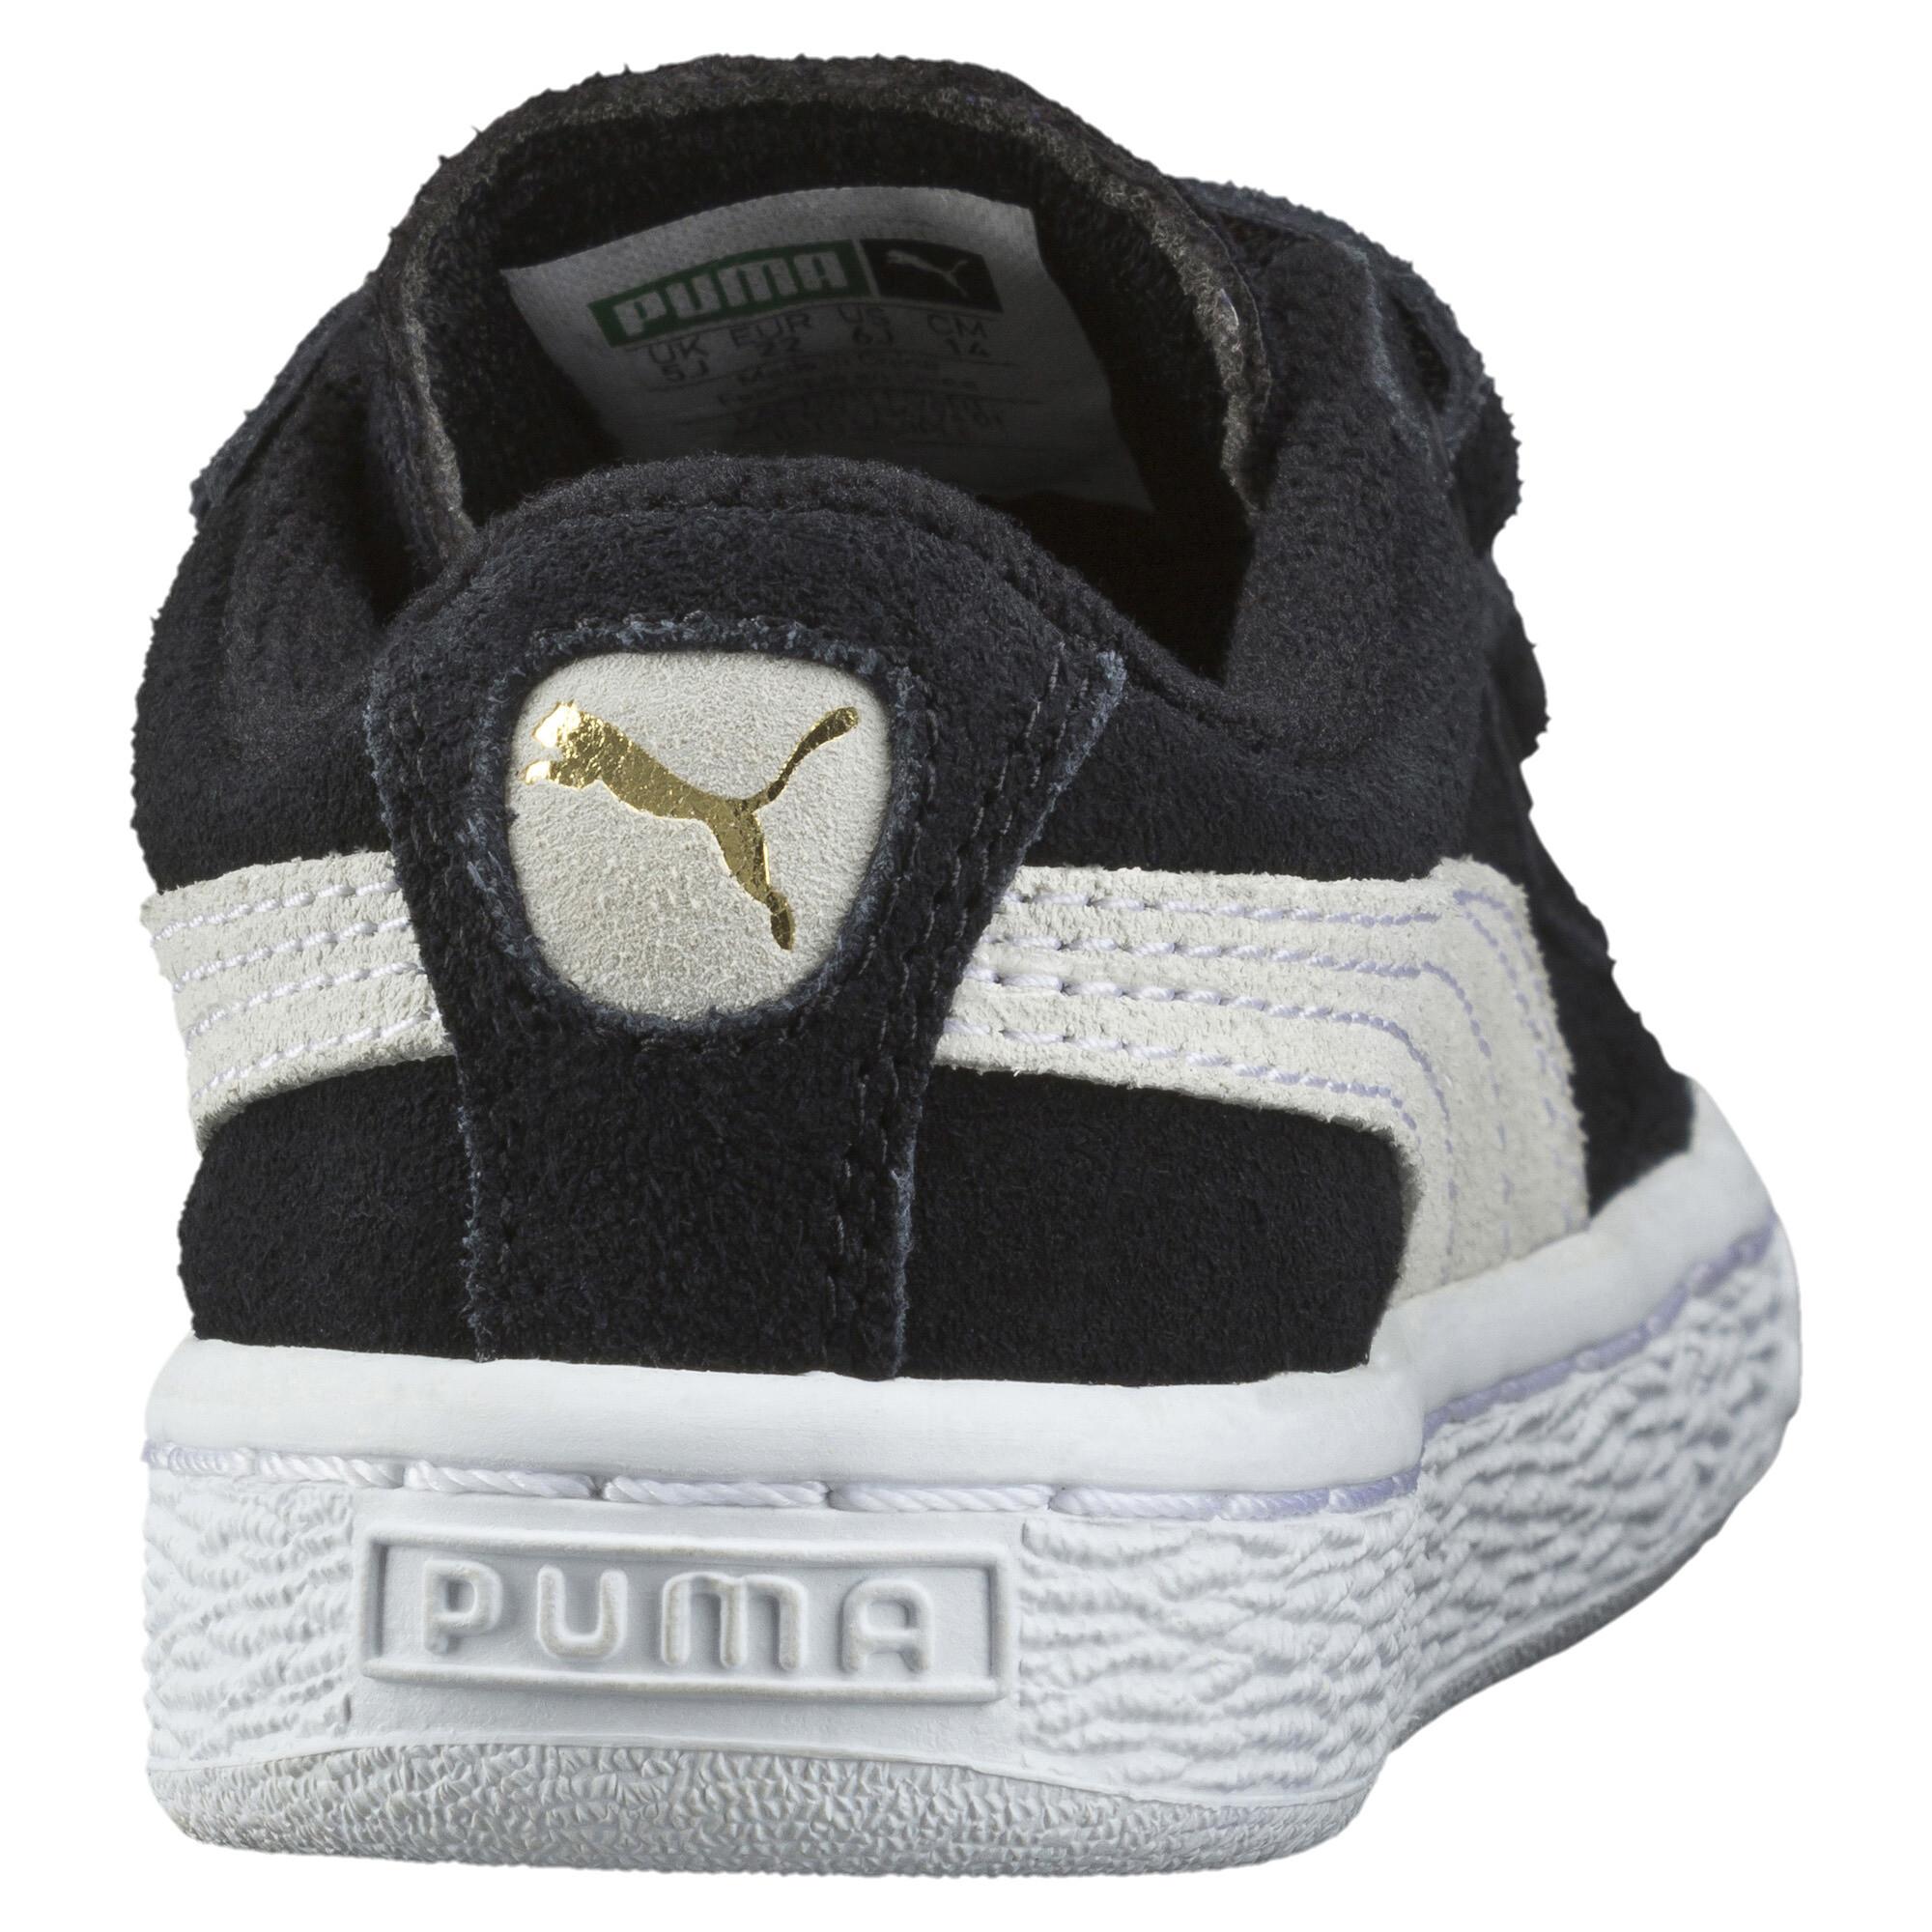 PUMA-Suede-AC-Toddler-Shoes-Kids-Shoe-Kids thumbnail 8